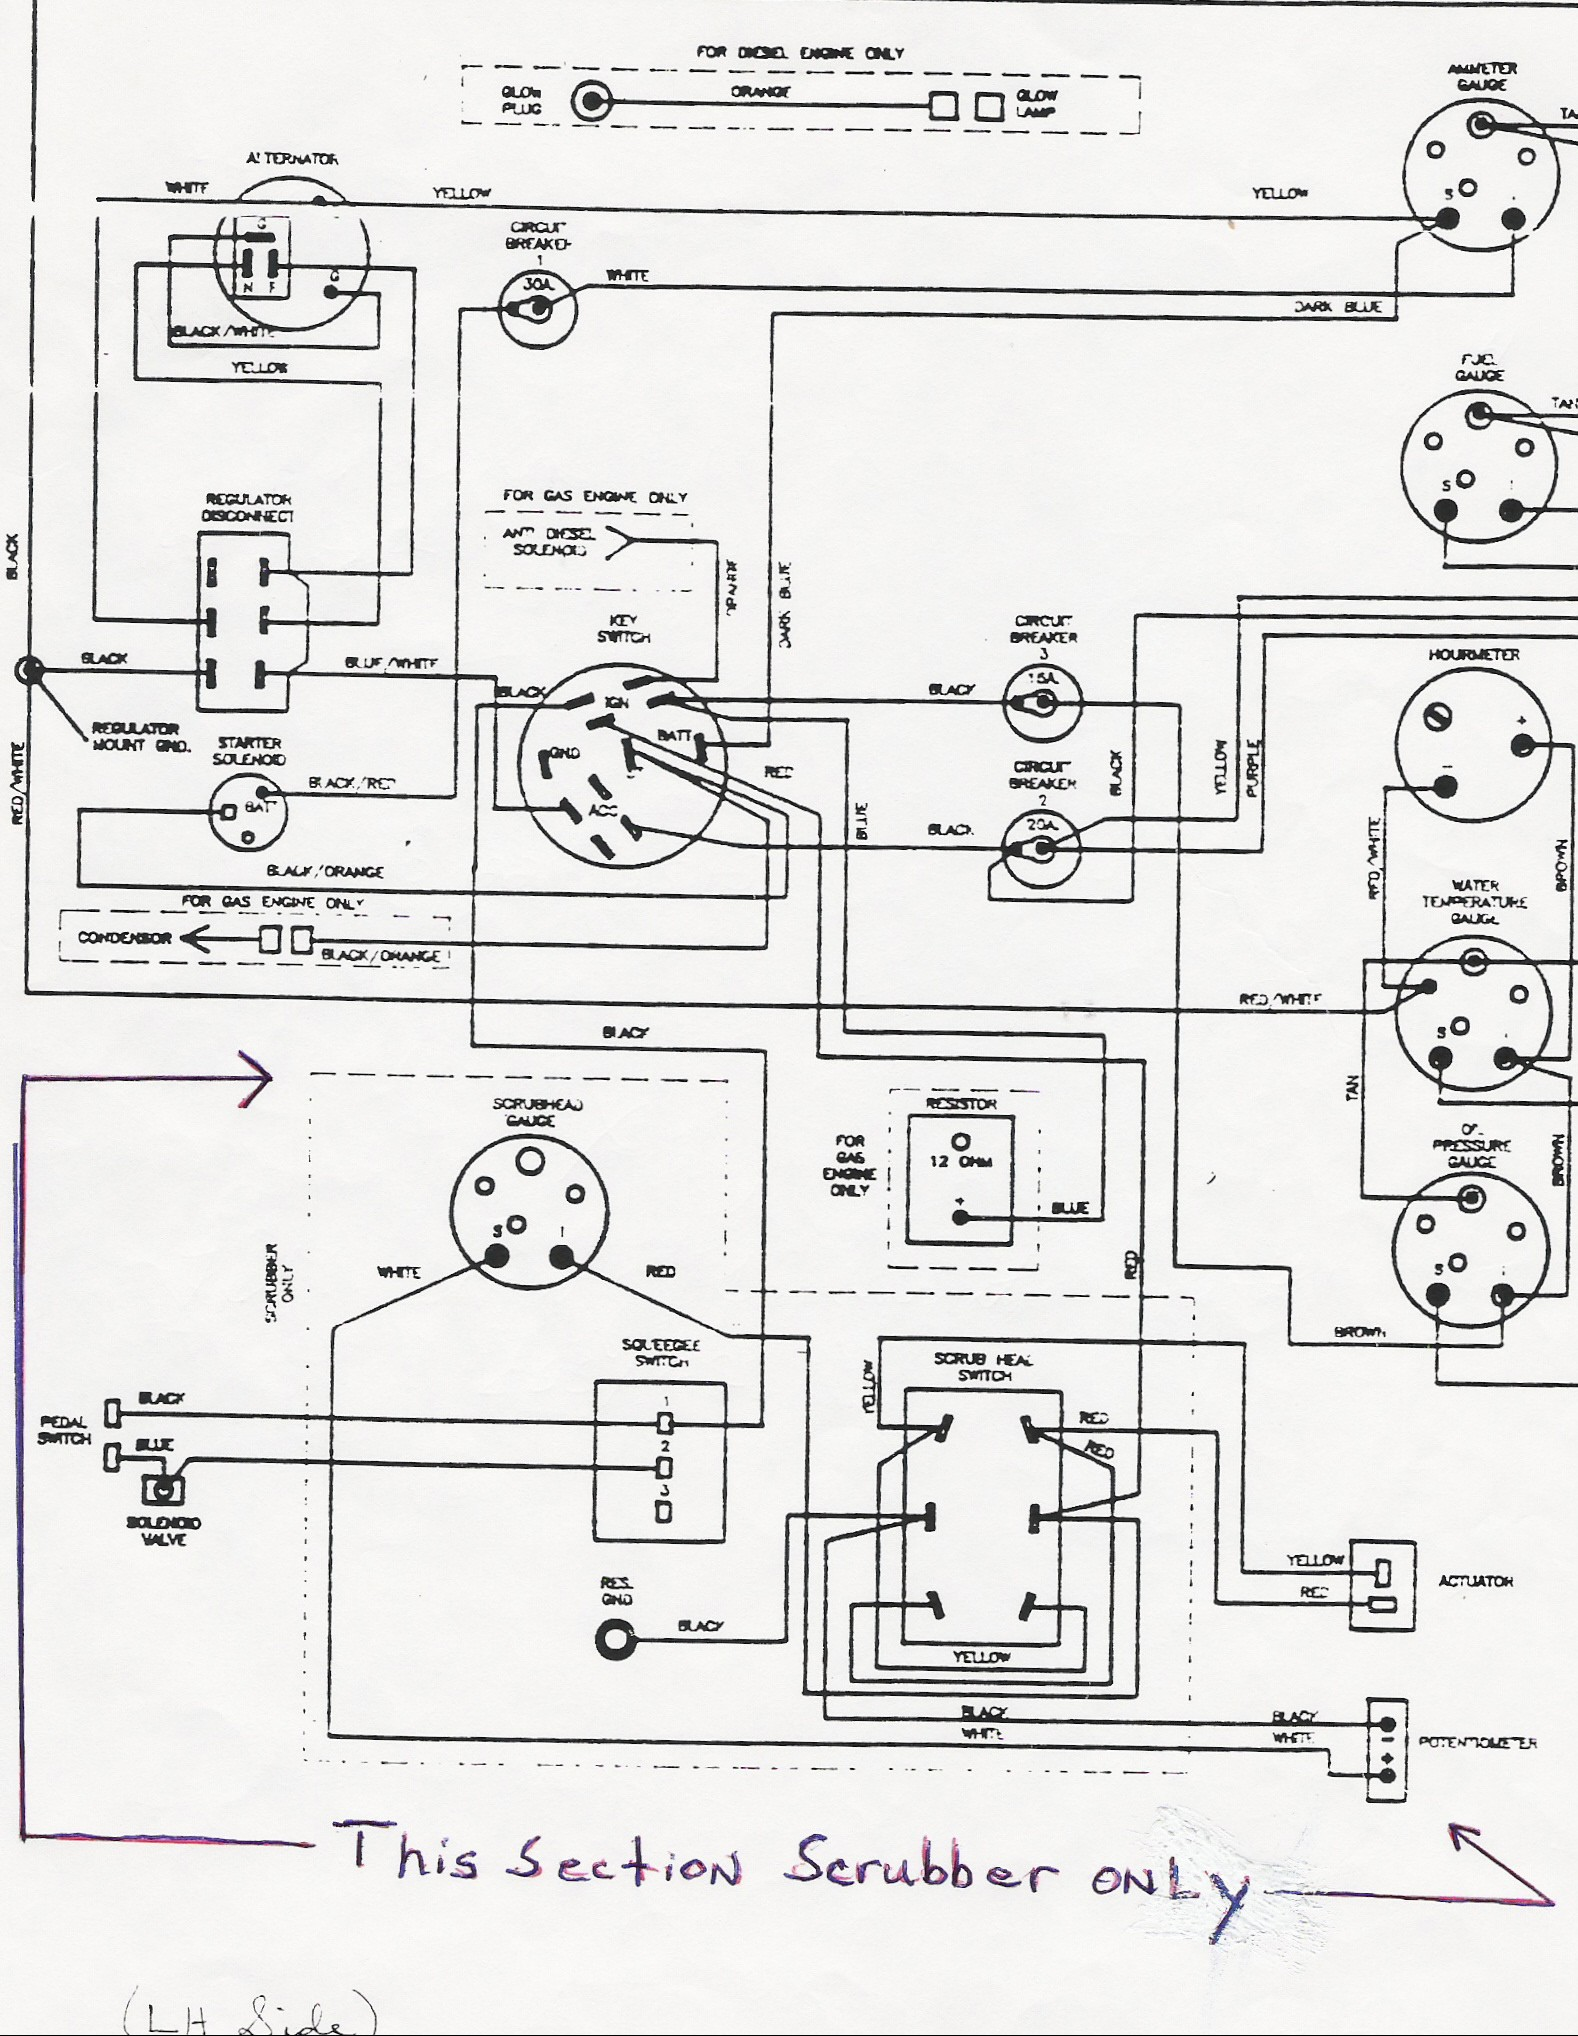 onan 4000 generator emerald 1 wiring diagram